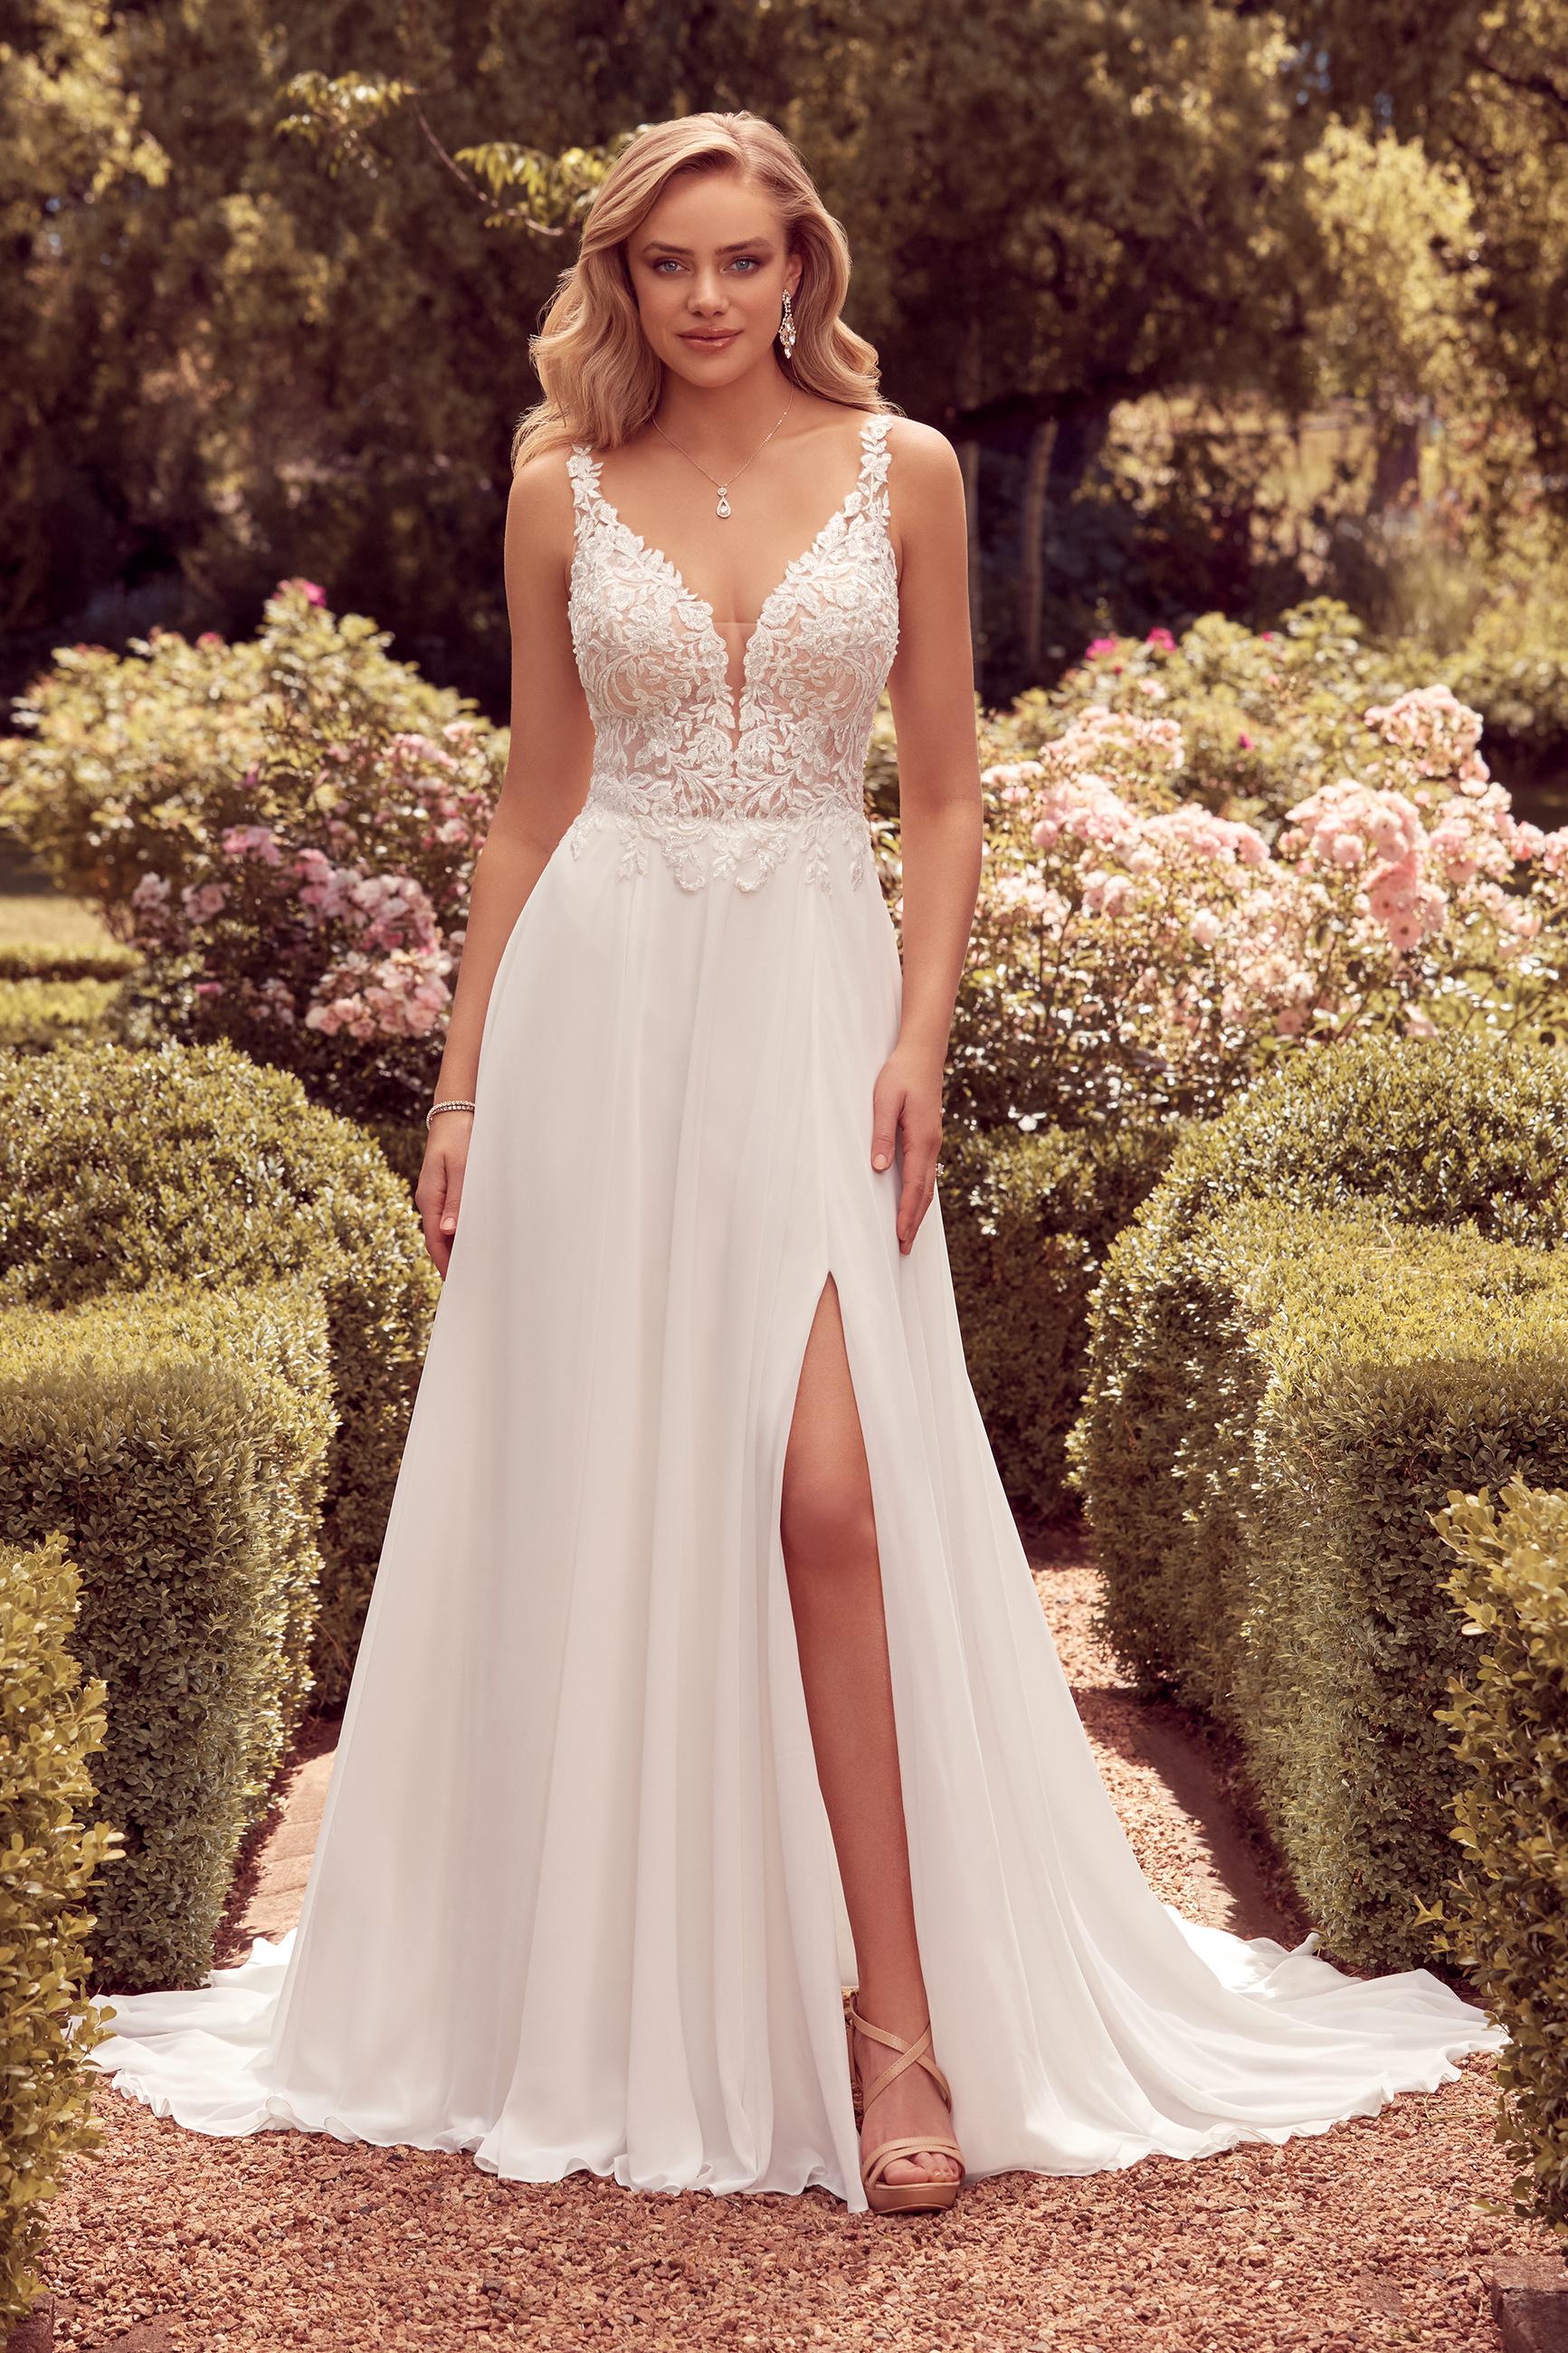 Beach Wedding Dresses   Destination Wedding Dresses   Sophia Tolli